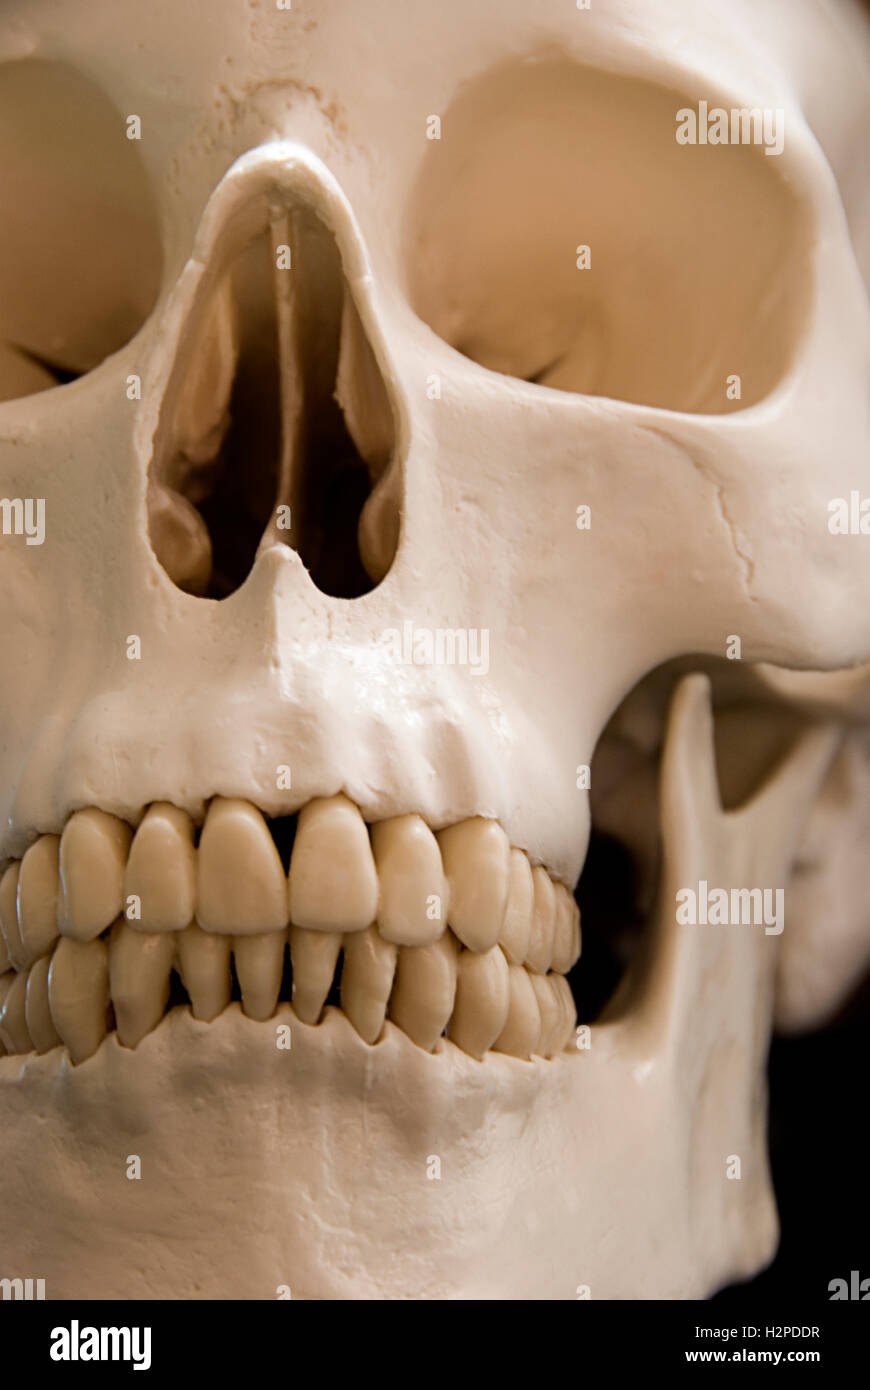 Cráneo humano closeup Imagen De Stock